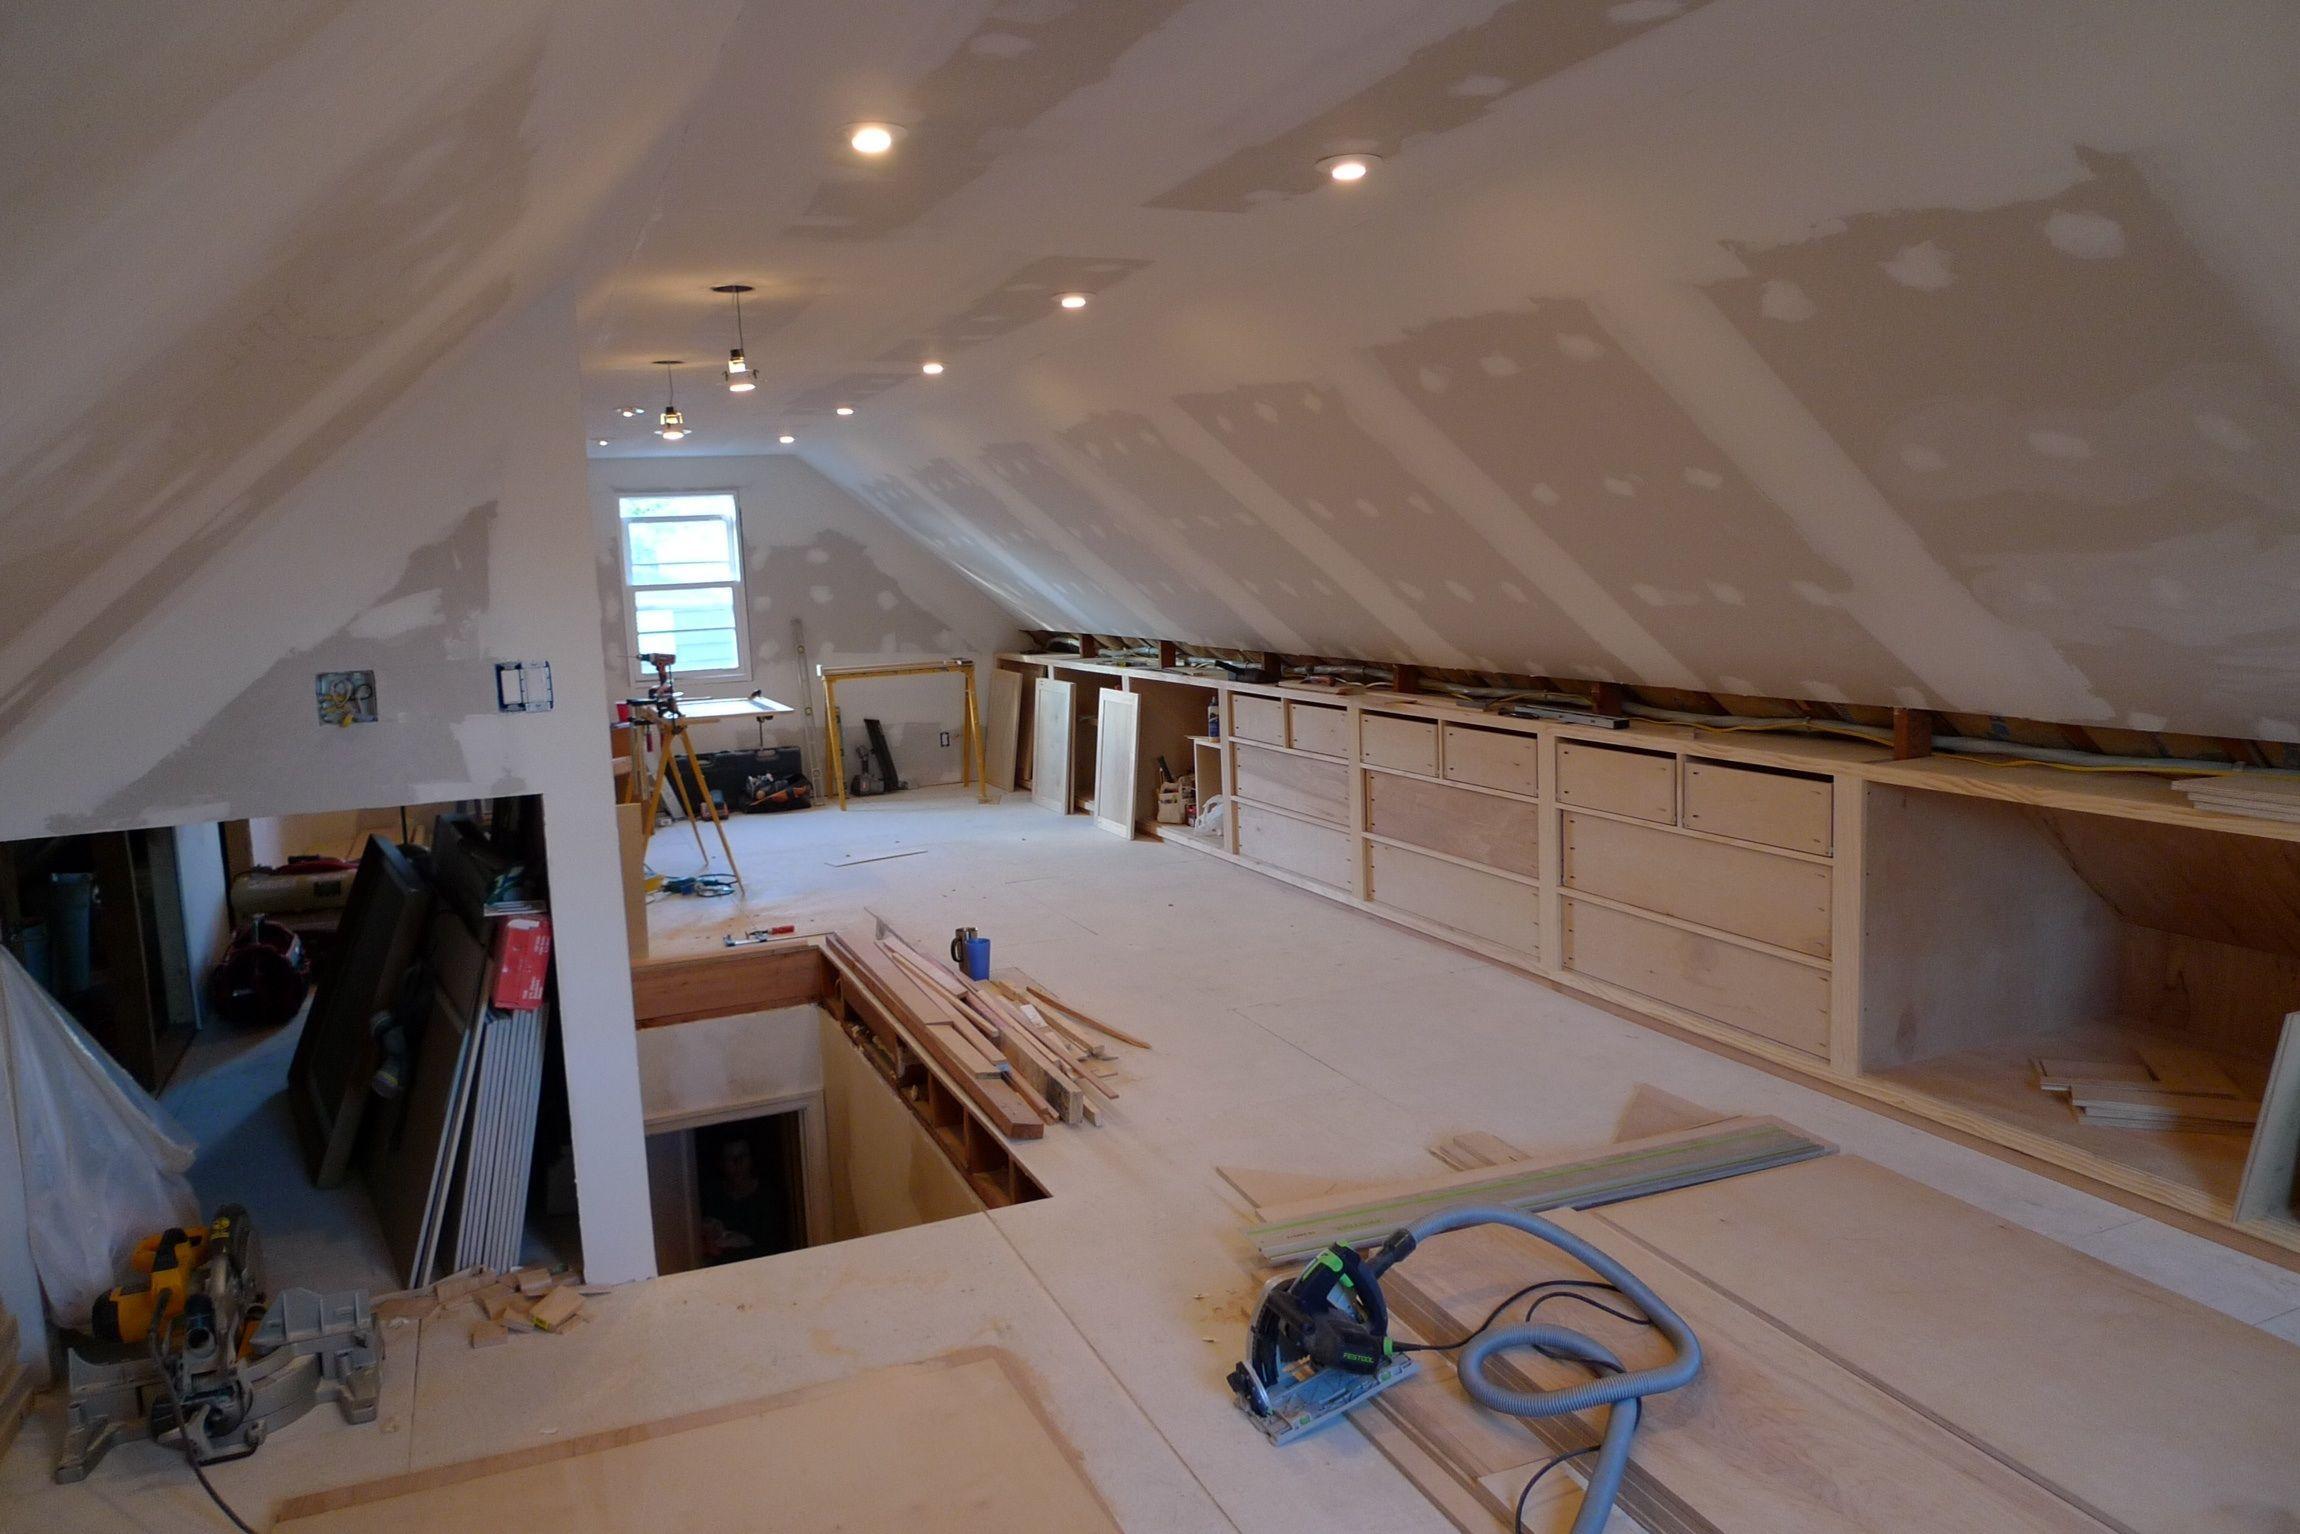 Attic Bedroom Design and Décor Tips   Attic bedroom storage, Attic ...